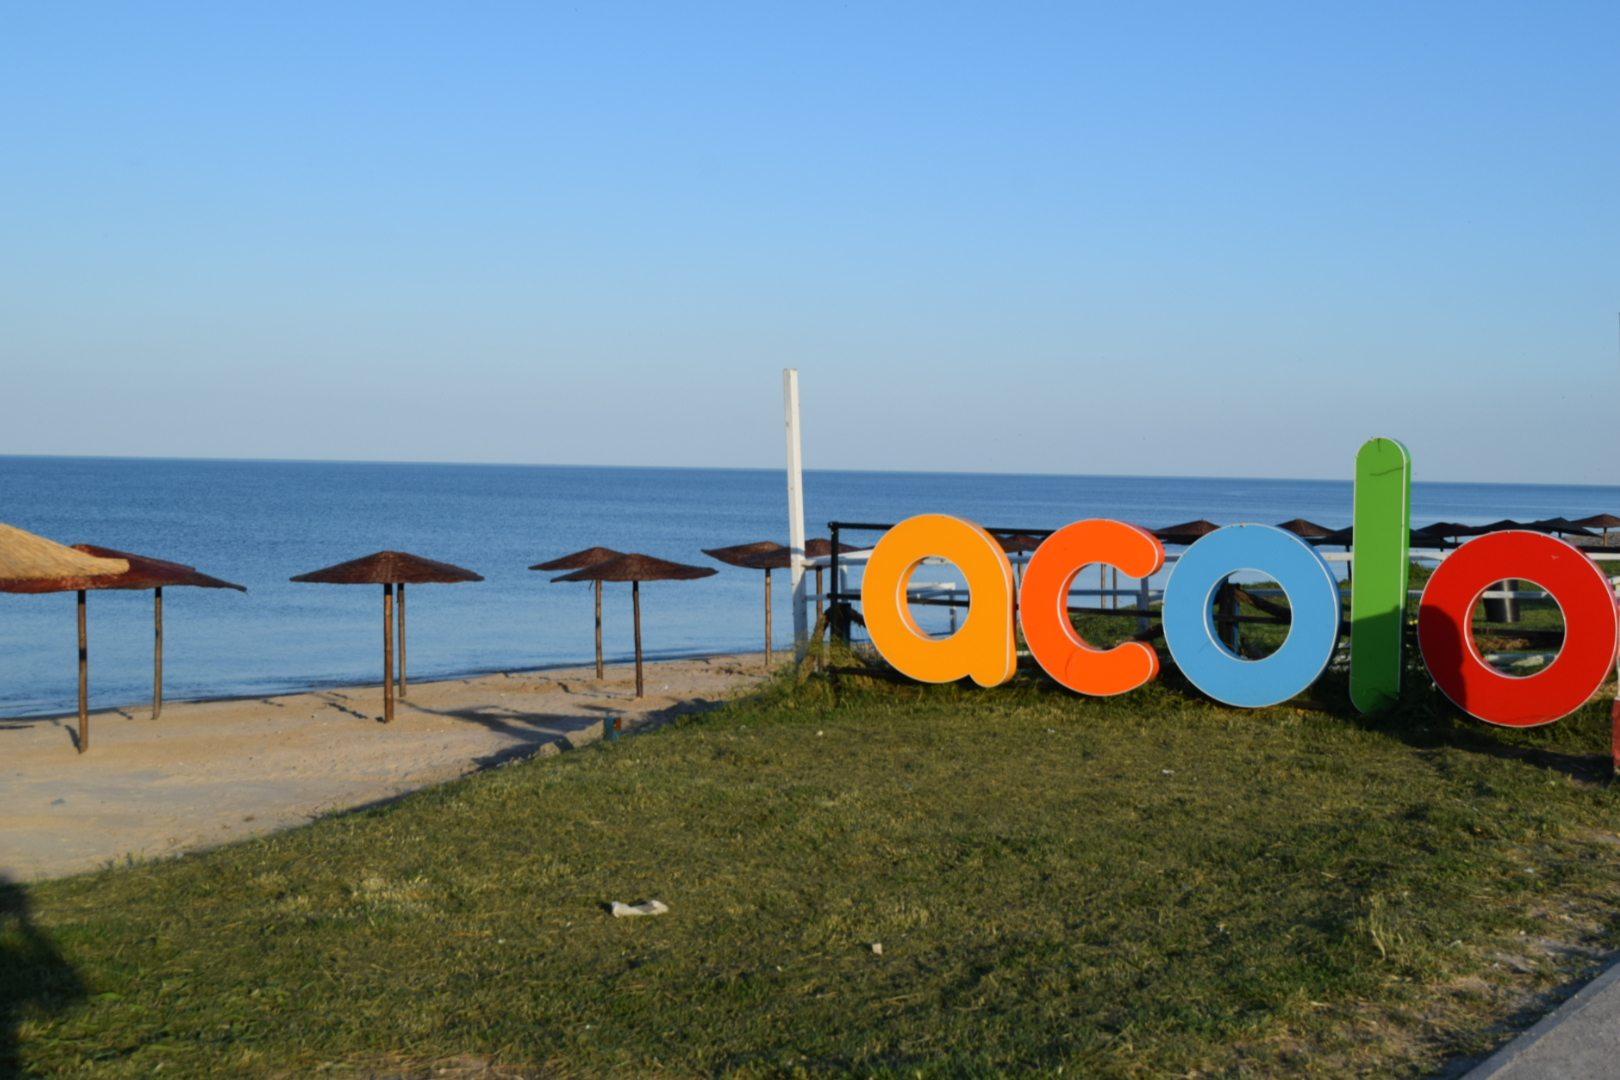 Plaja Acolo